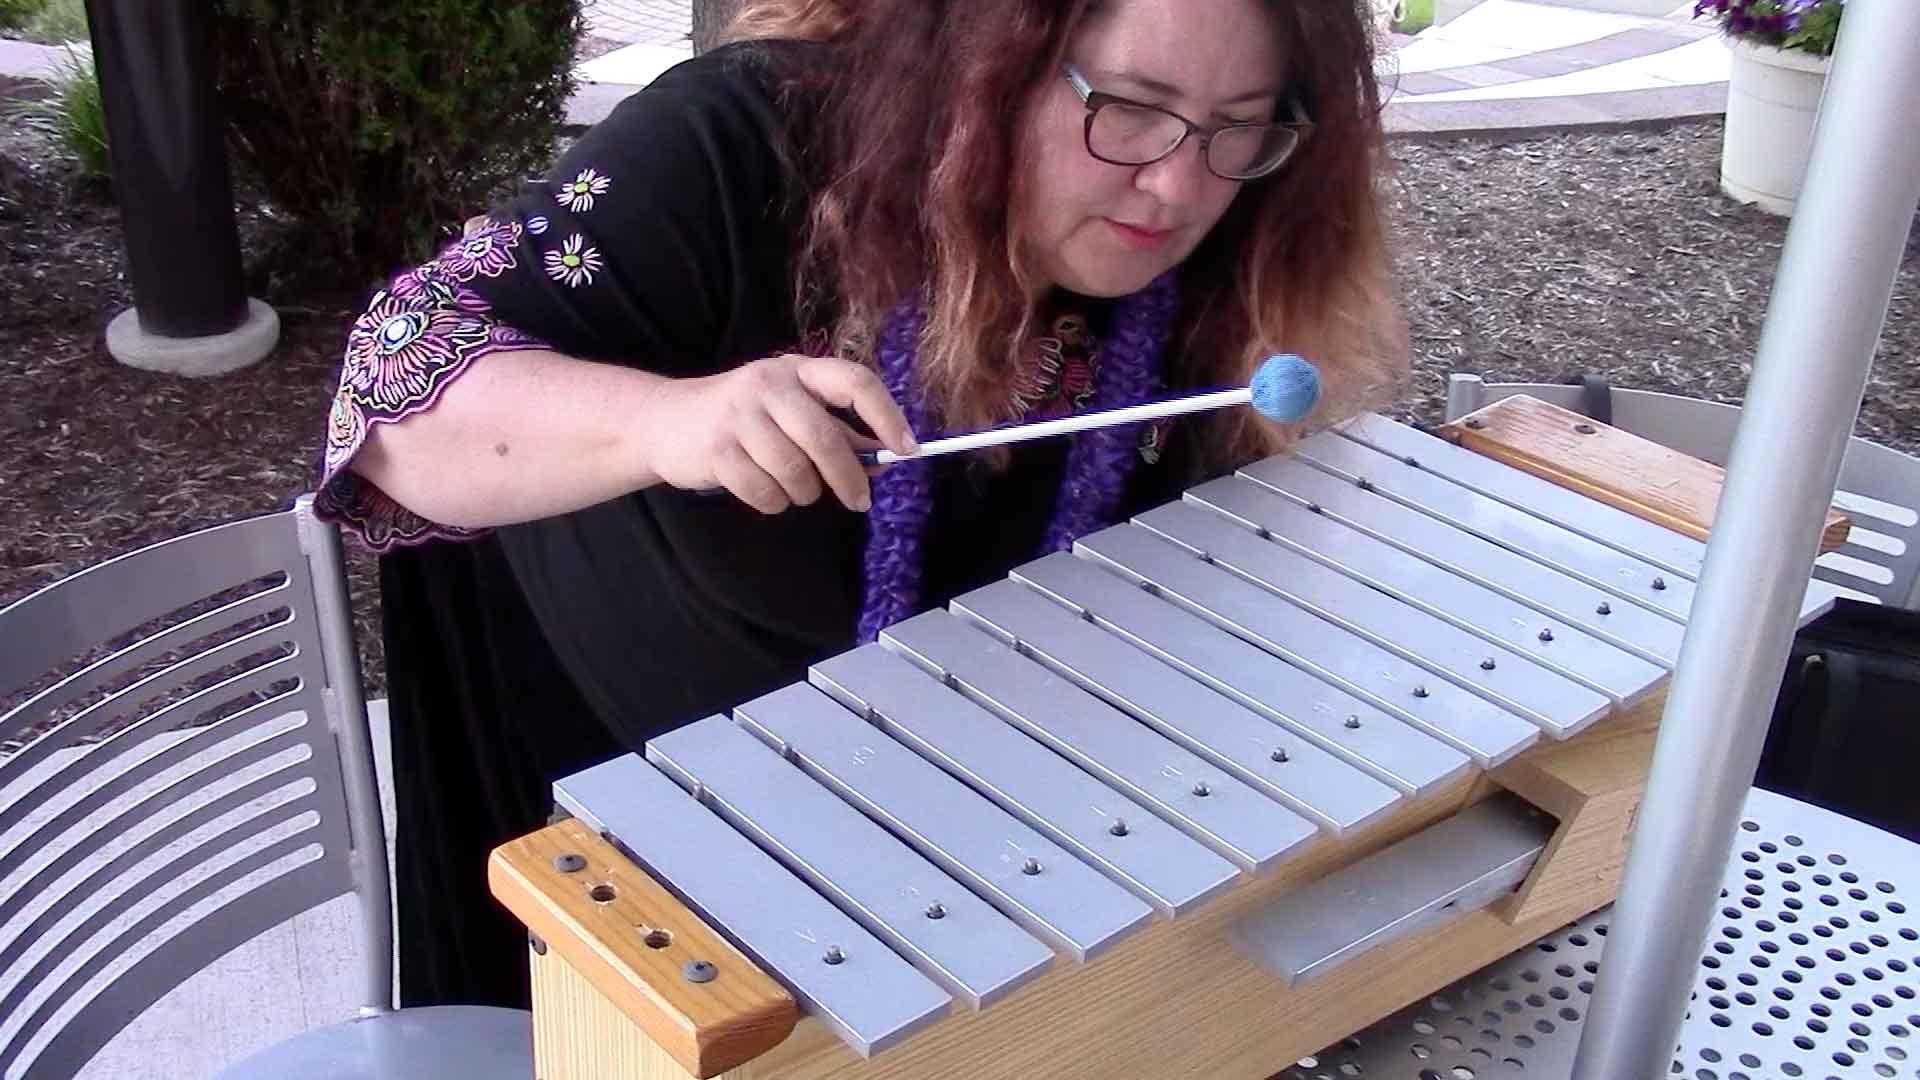 Melanie plays the xylophone